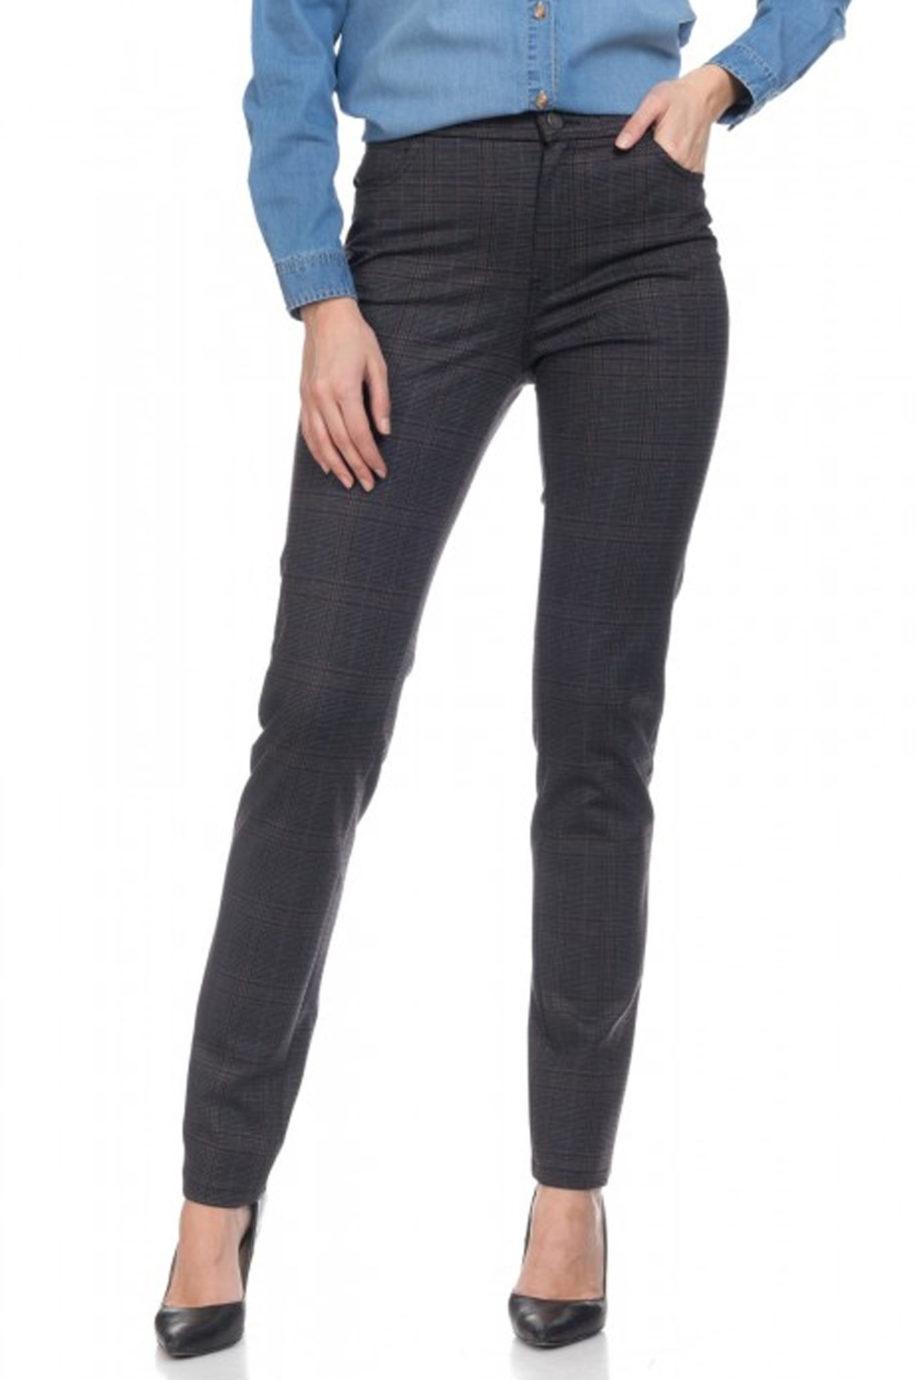 pantalon-mujer-cuadros-fost116